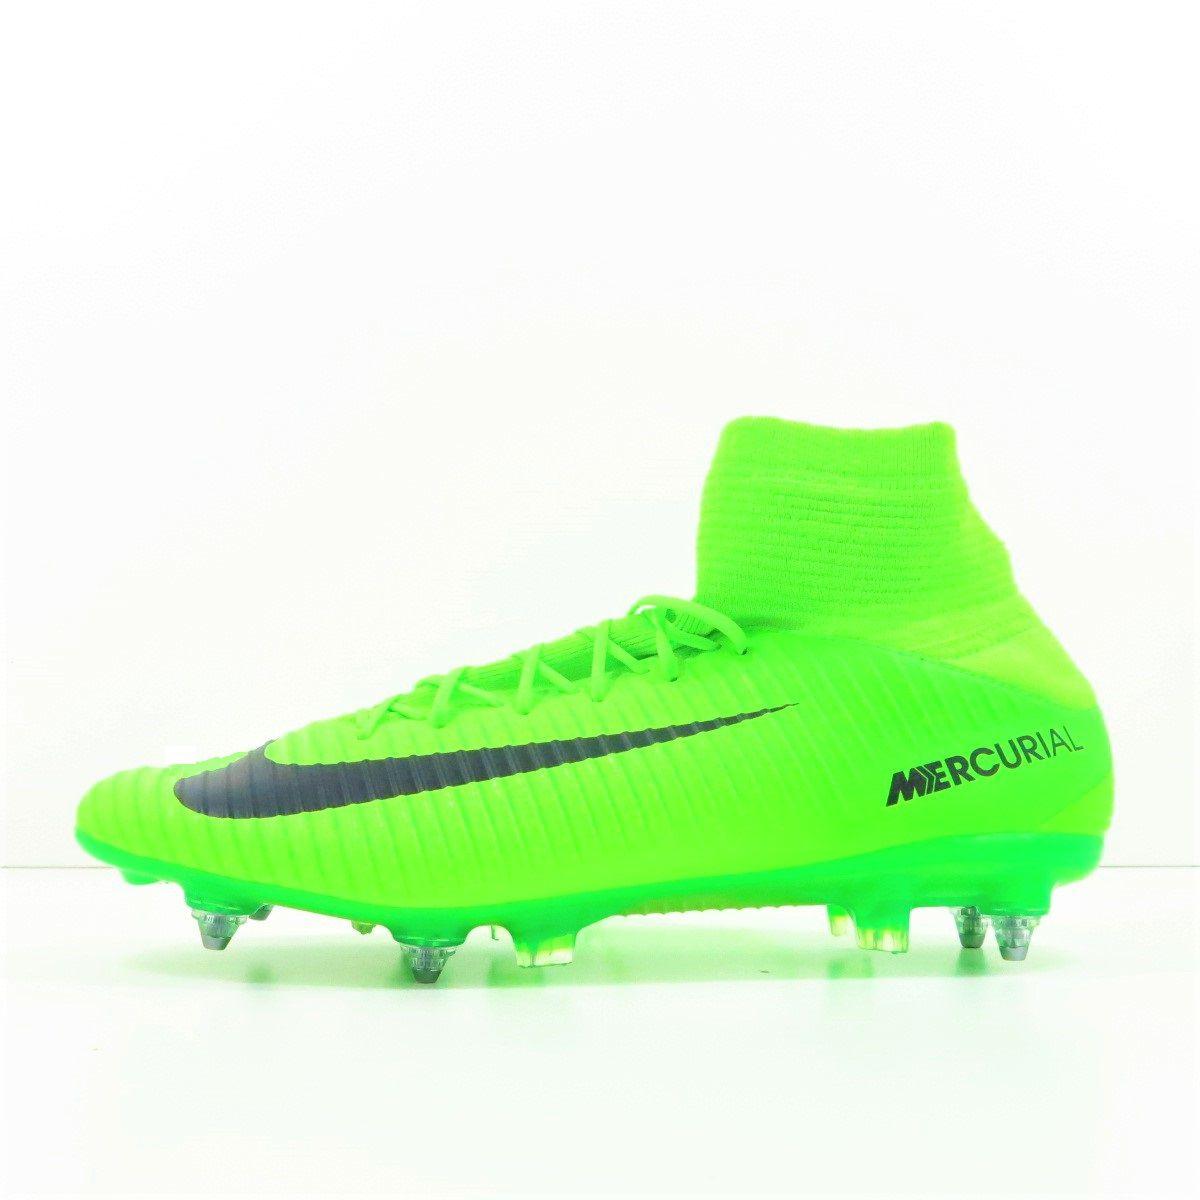 Chuteira Nike Mercurial Veloce Sg Pro - Trava Mista